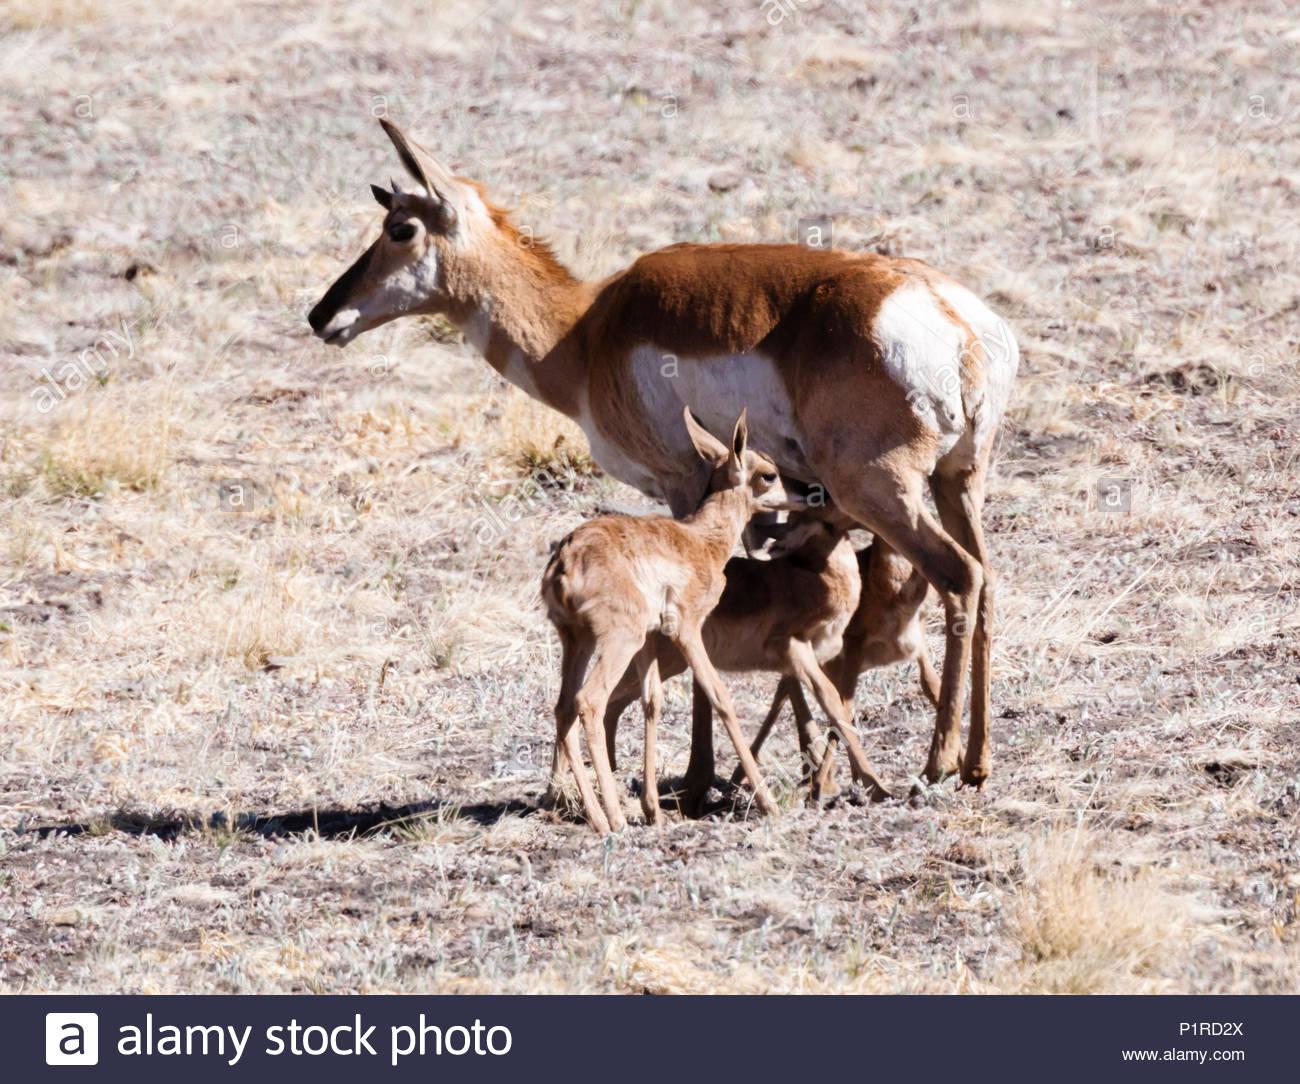 nurse mammals stock photos nurse mammals stock images alamy